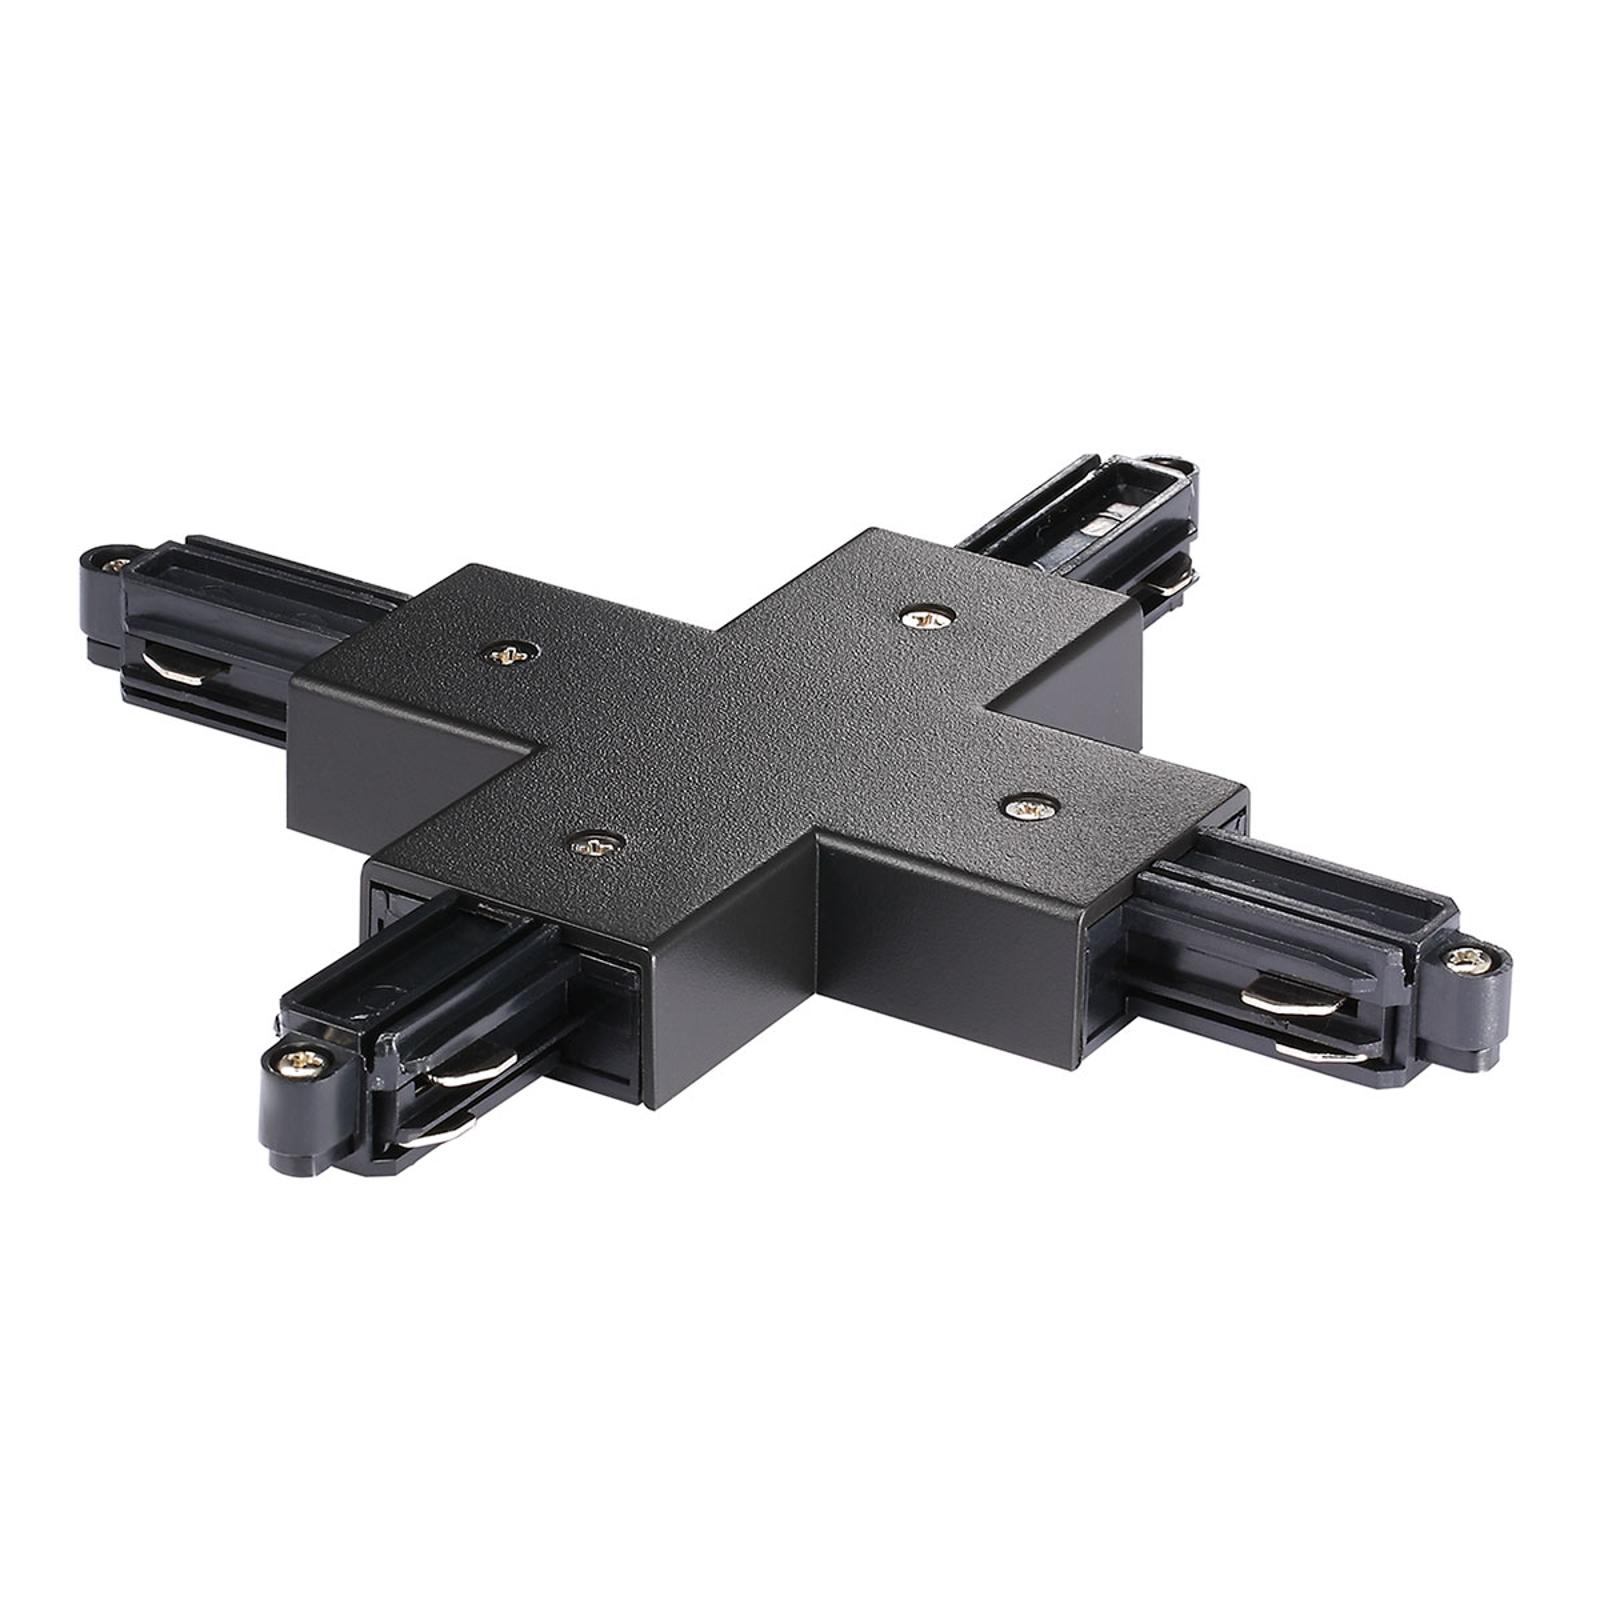 X-kontakt for strømskinne Link, svart